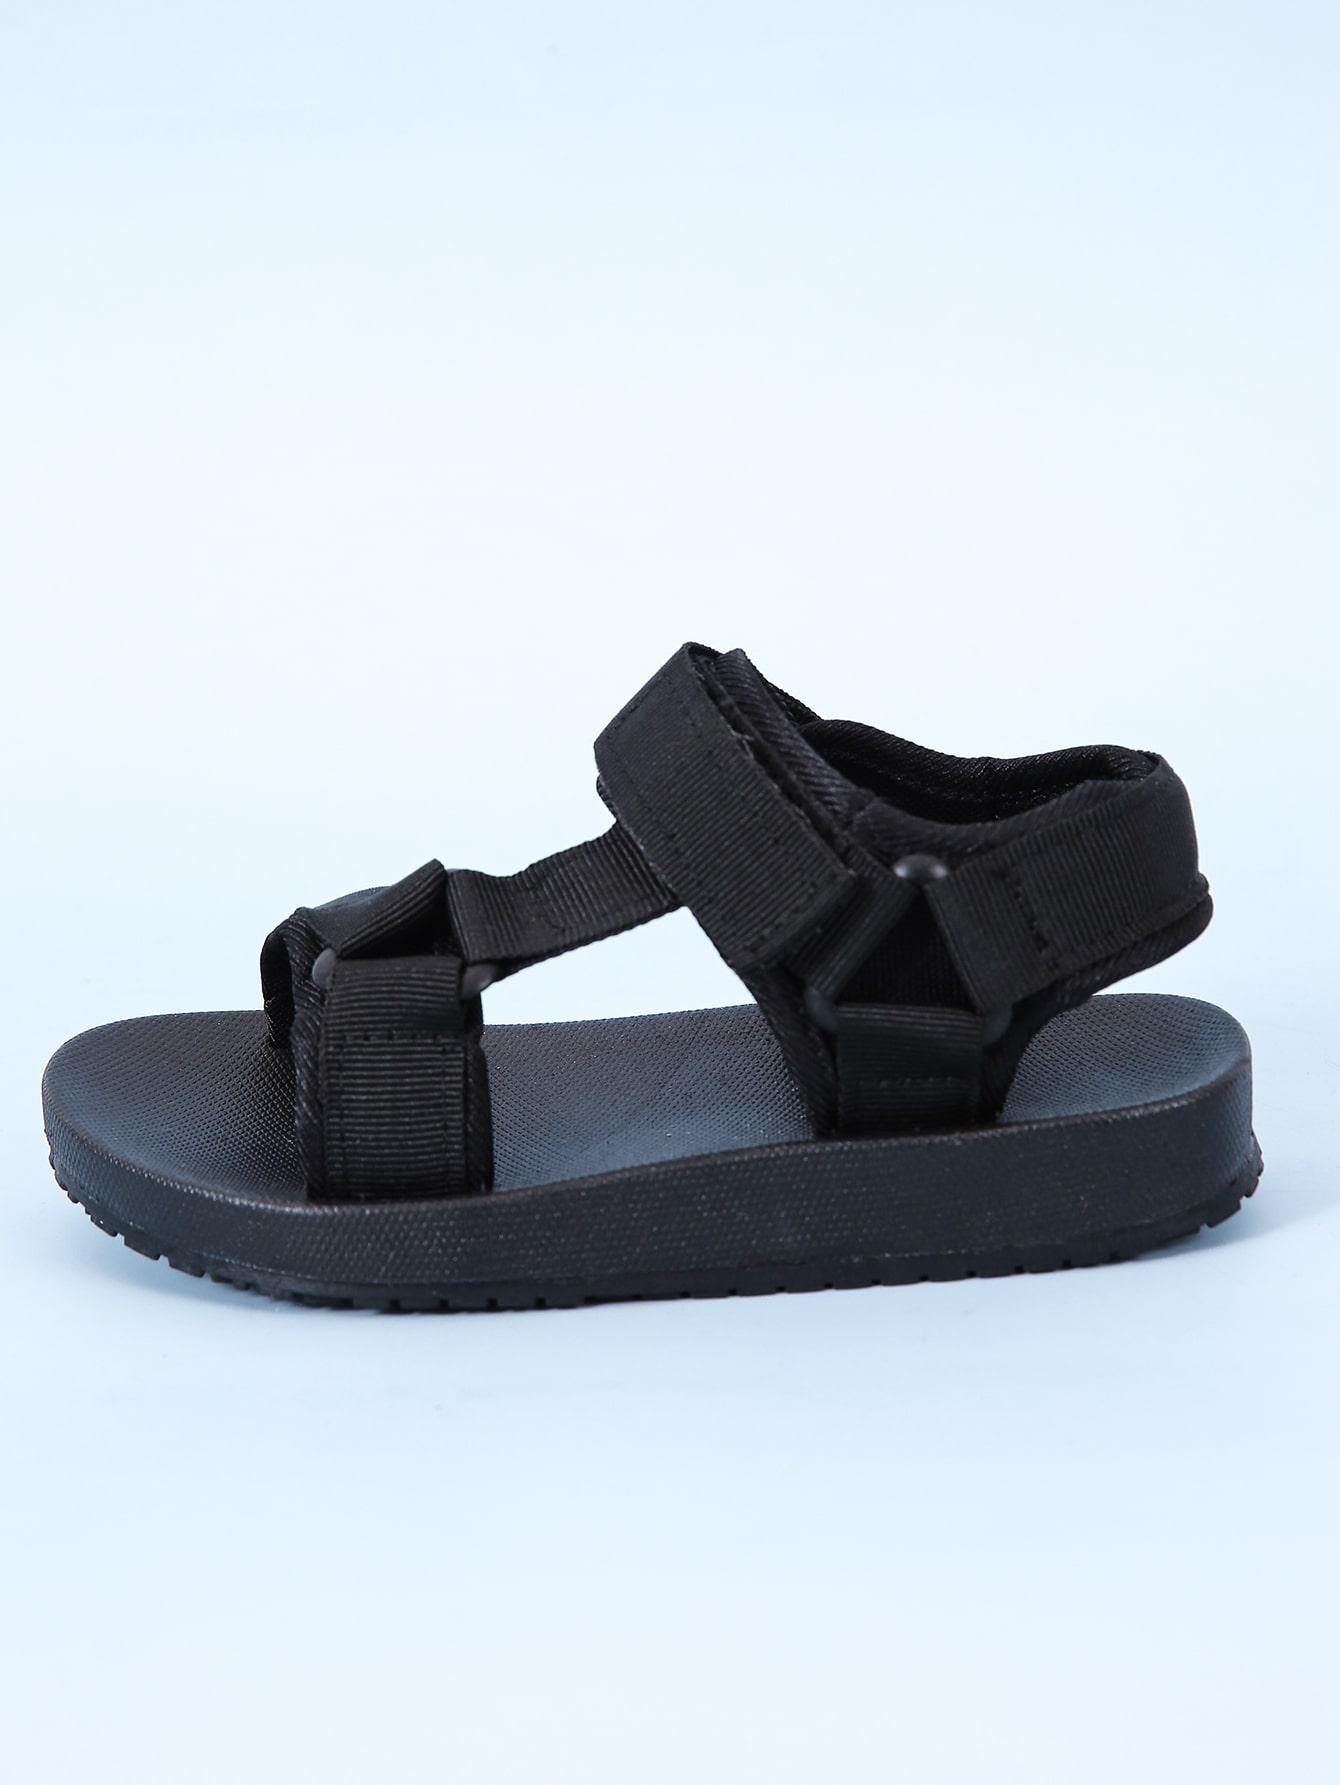 Boys Minimalist Velcro Strap Sport Sandals